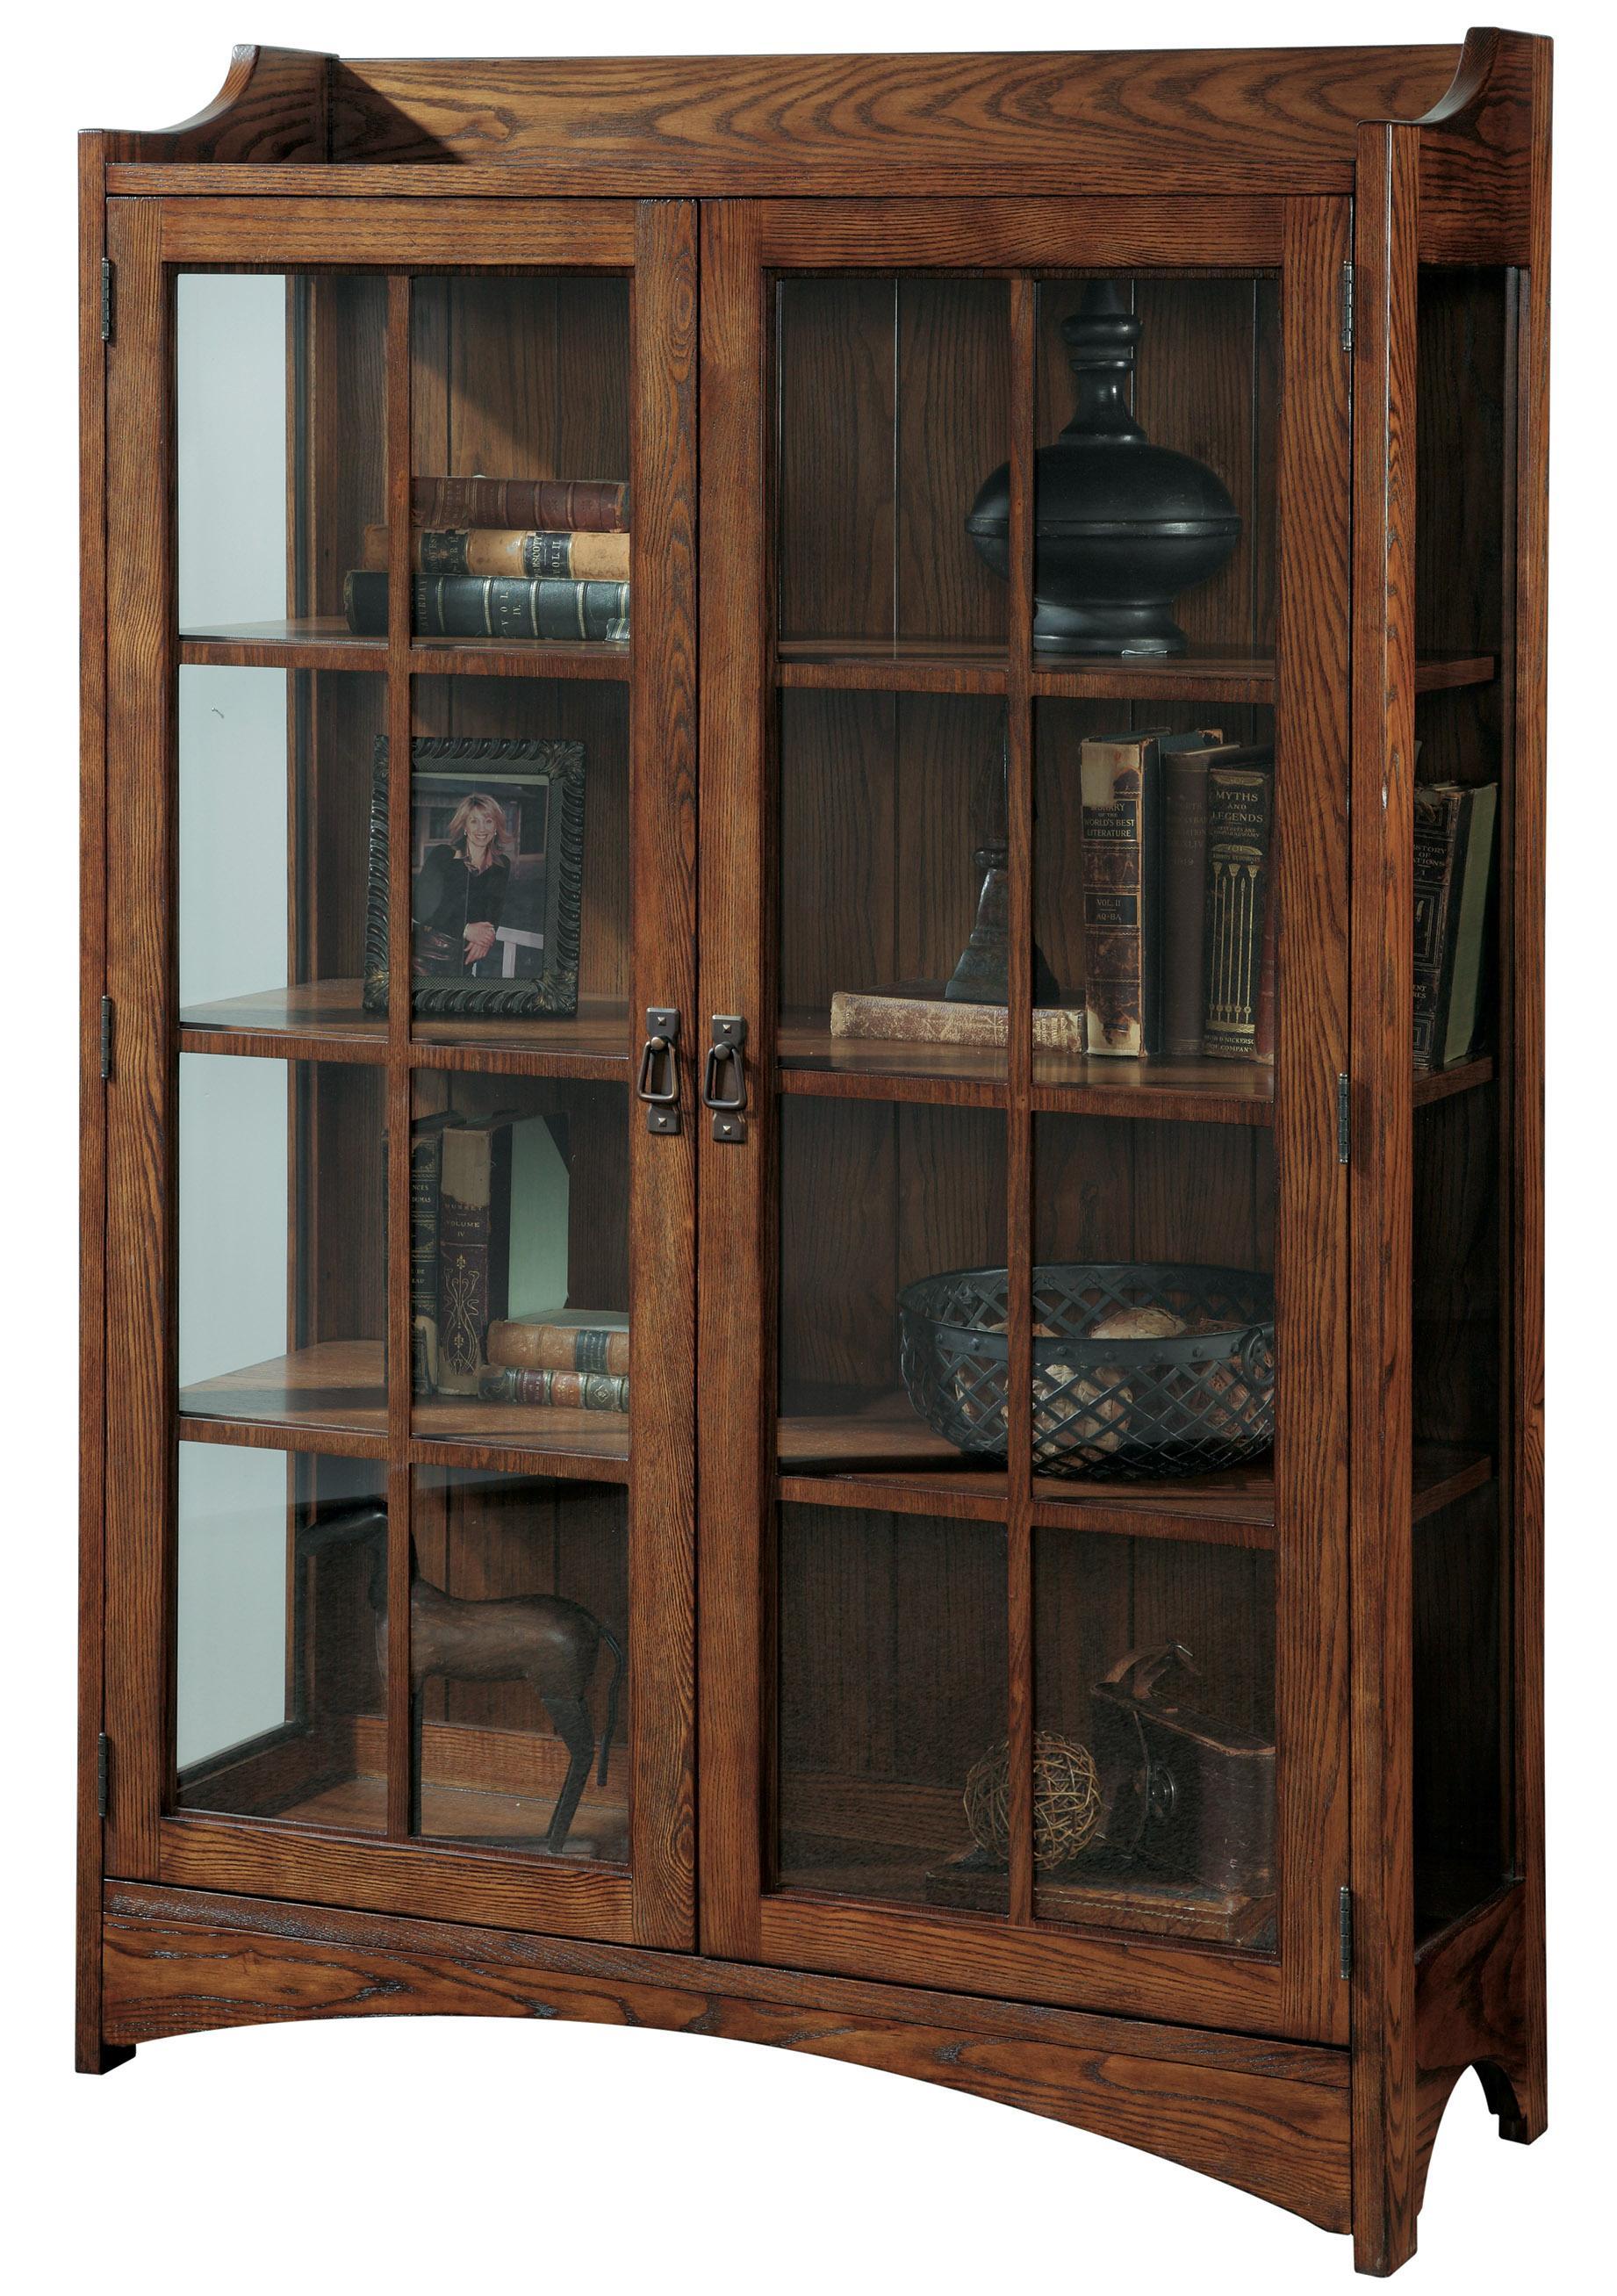 Pulaski Furniture Curios Bennet Bookcase Curio Olinde 39 S Furniture Curio Cabinet